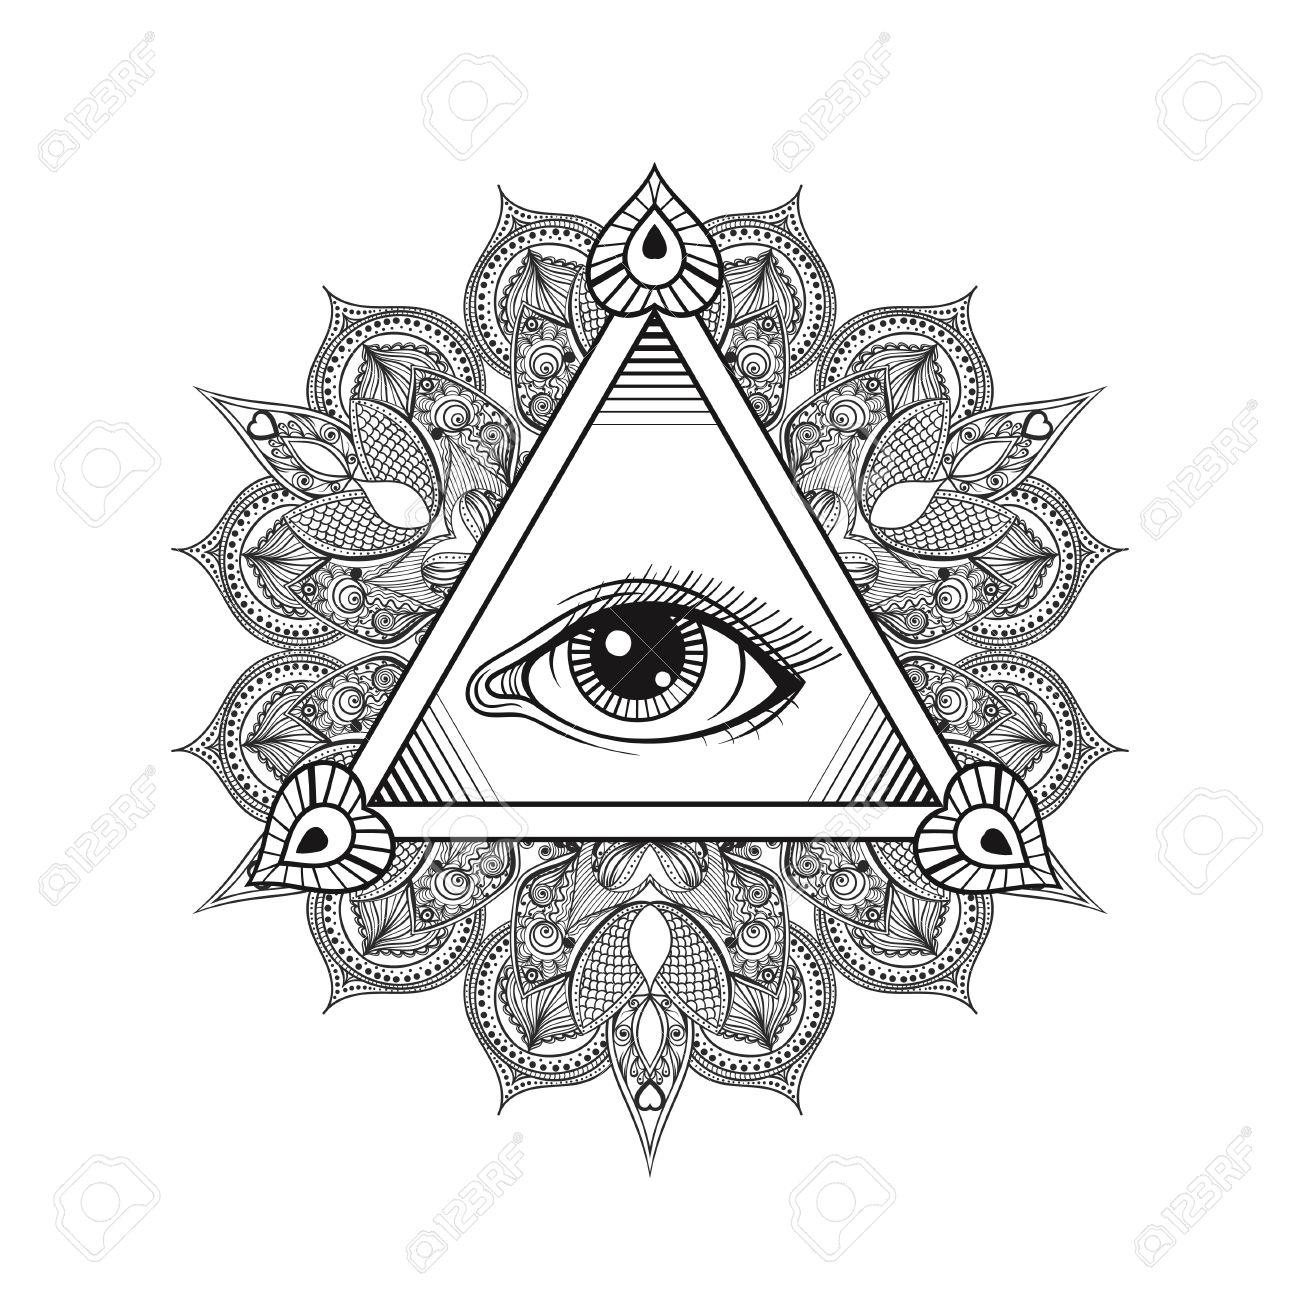 Vector All Seeing Eye Pyramid Symbol Tattoo Design Vintage